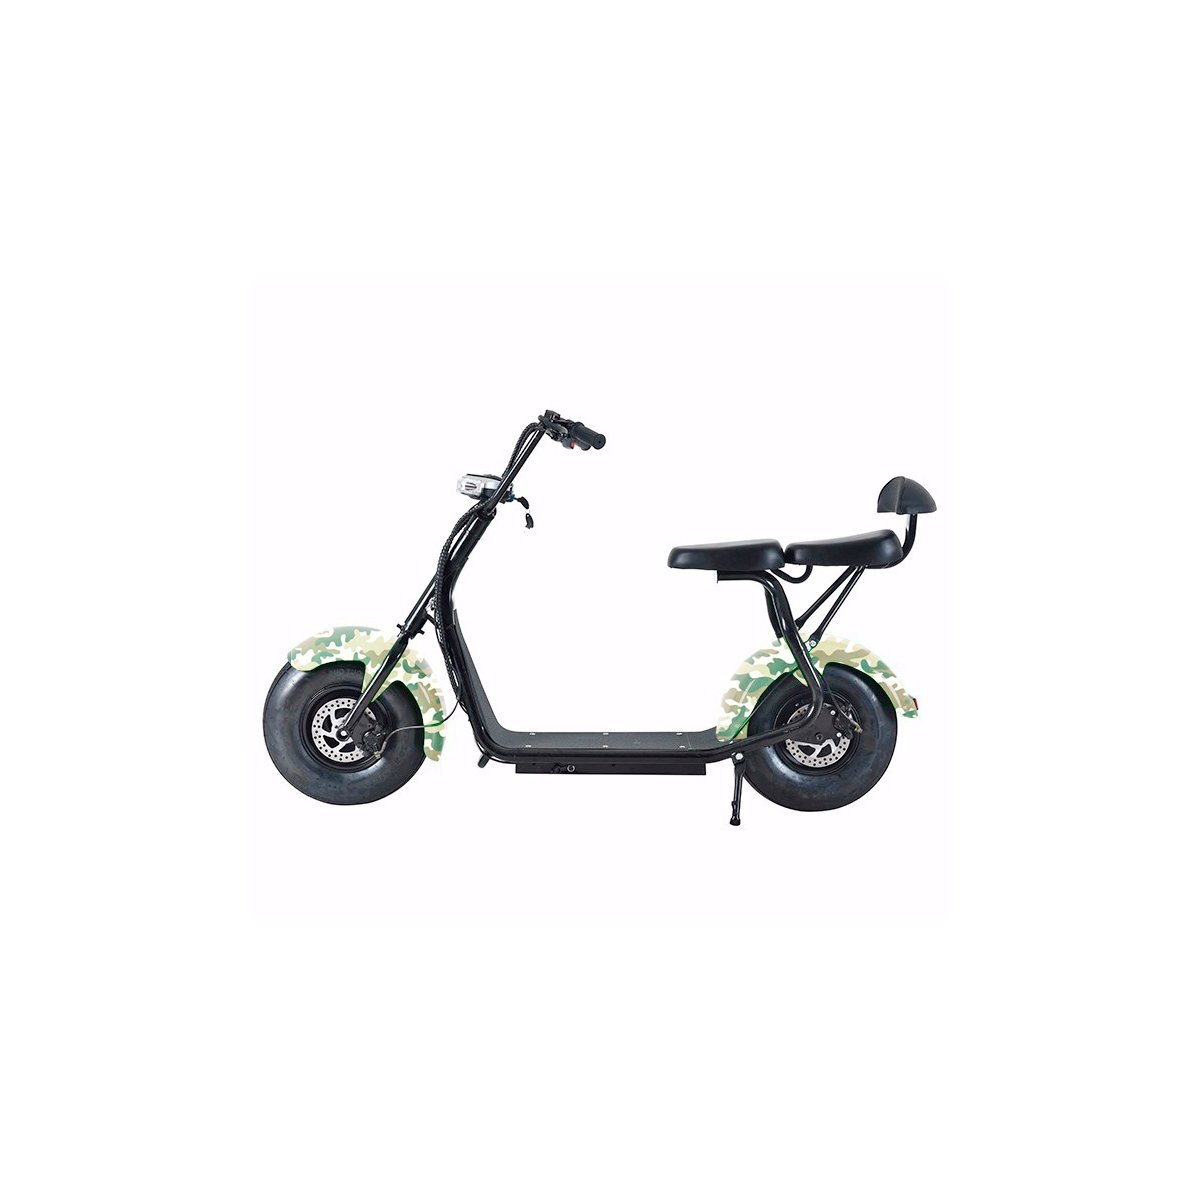 Citycoco Scooter Moto Eléctrica Harley 1000W Bluetooth ...